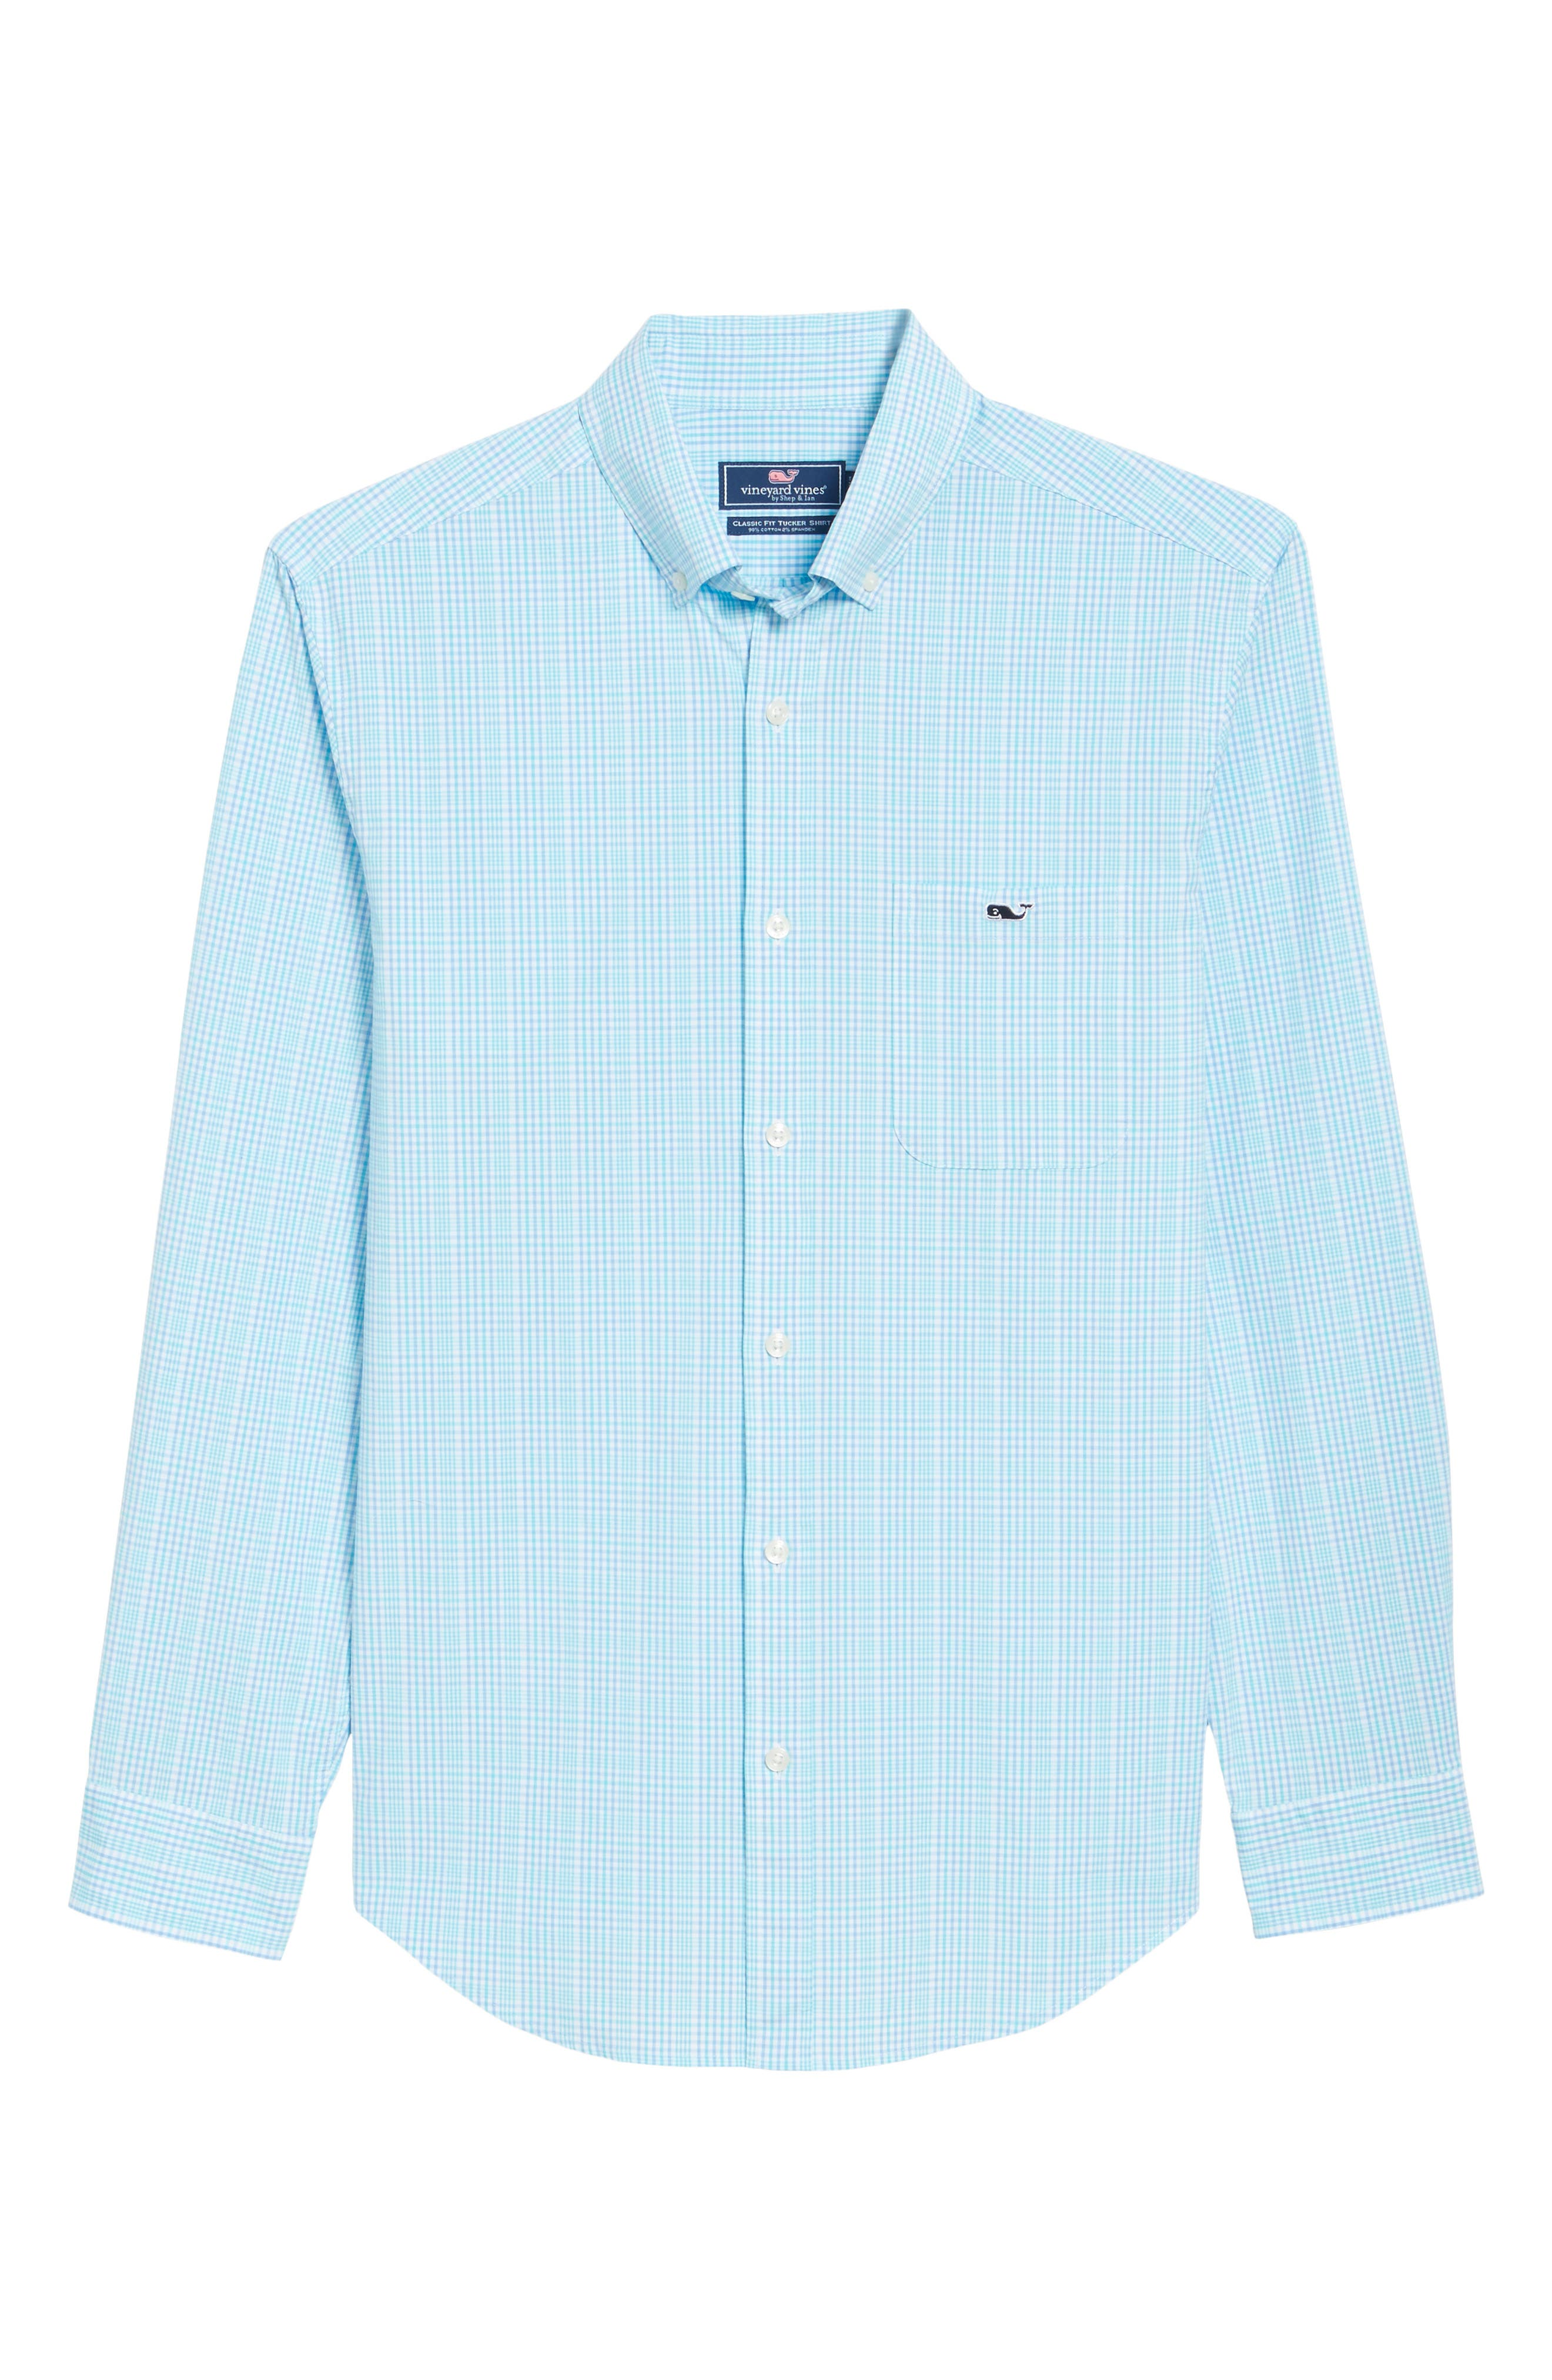 Rolling Harbor Classic Fit Plaid Sport Shirt,                             Alternate thumbnail 6, color,                             459